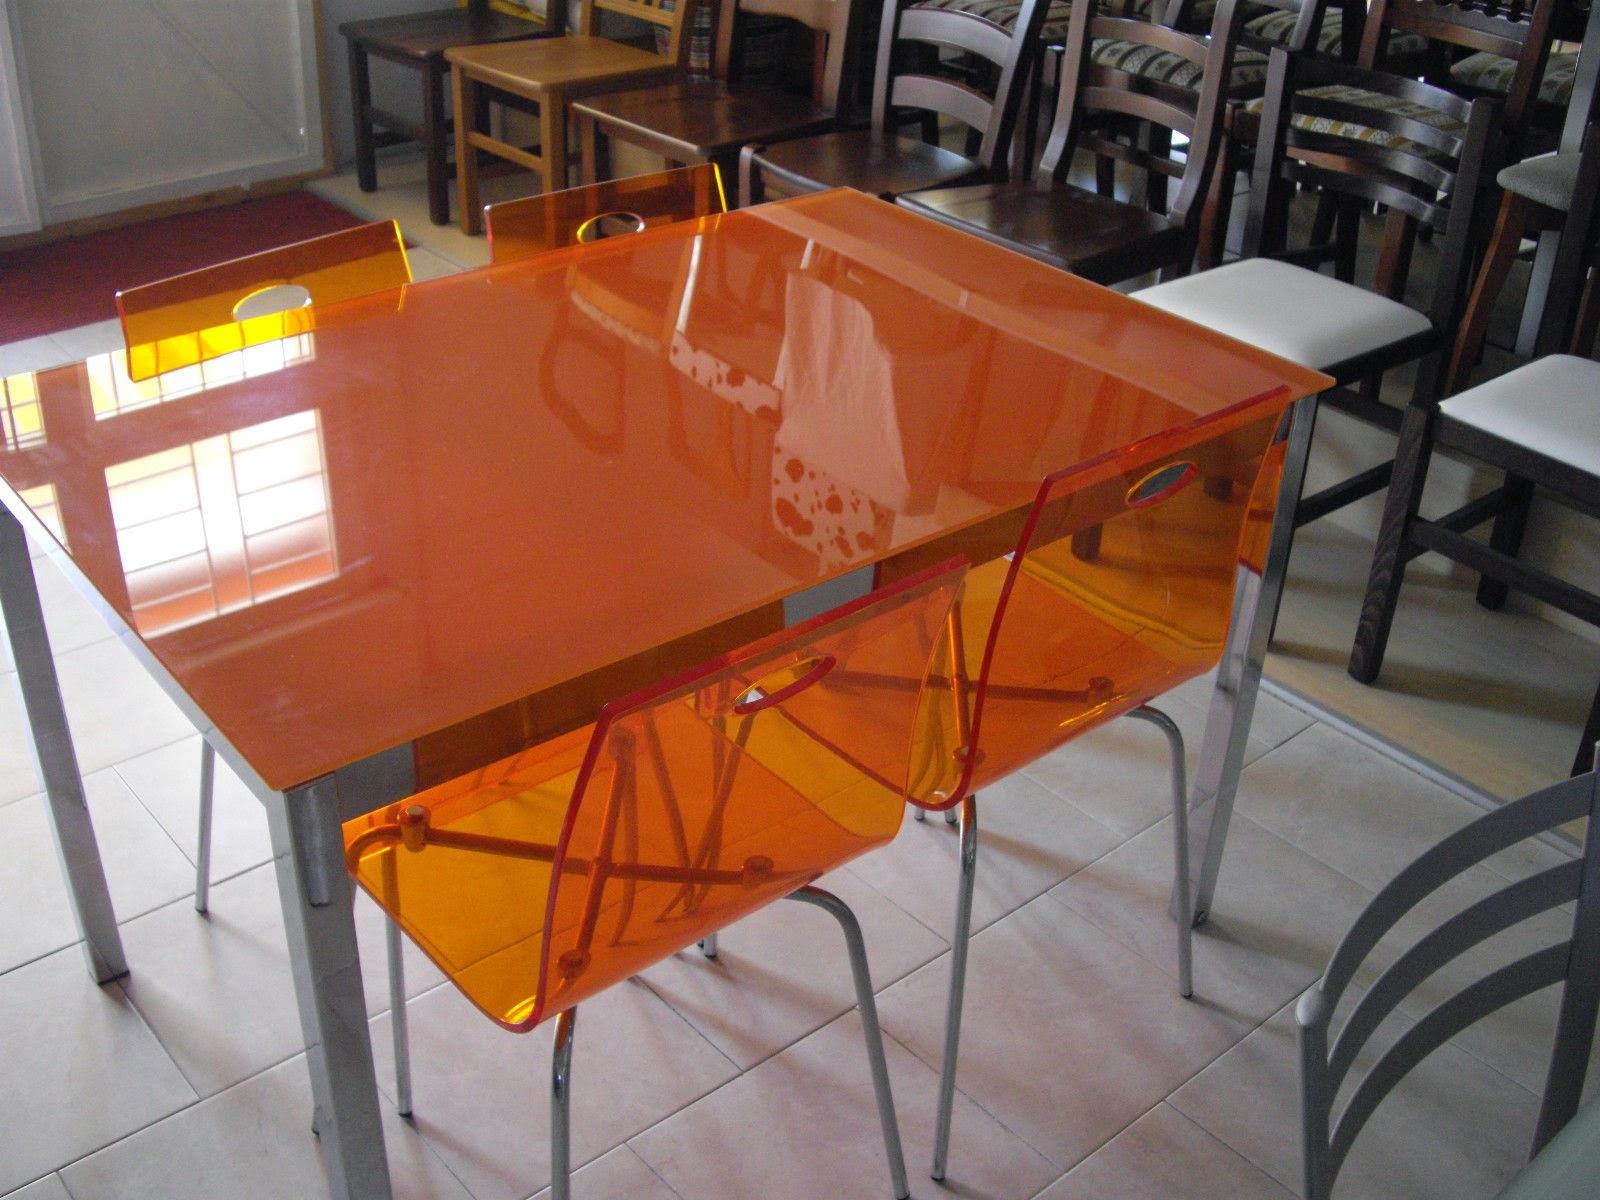 Tavolo Cucina Allungabile Vetro.Set Tavolo In Vetro Allungabile Con 4 Sedie Metacrill Arancio